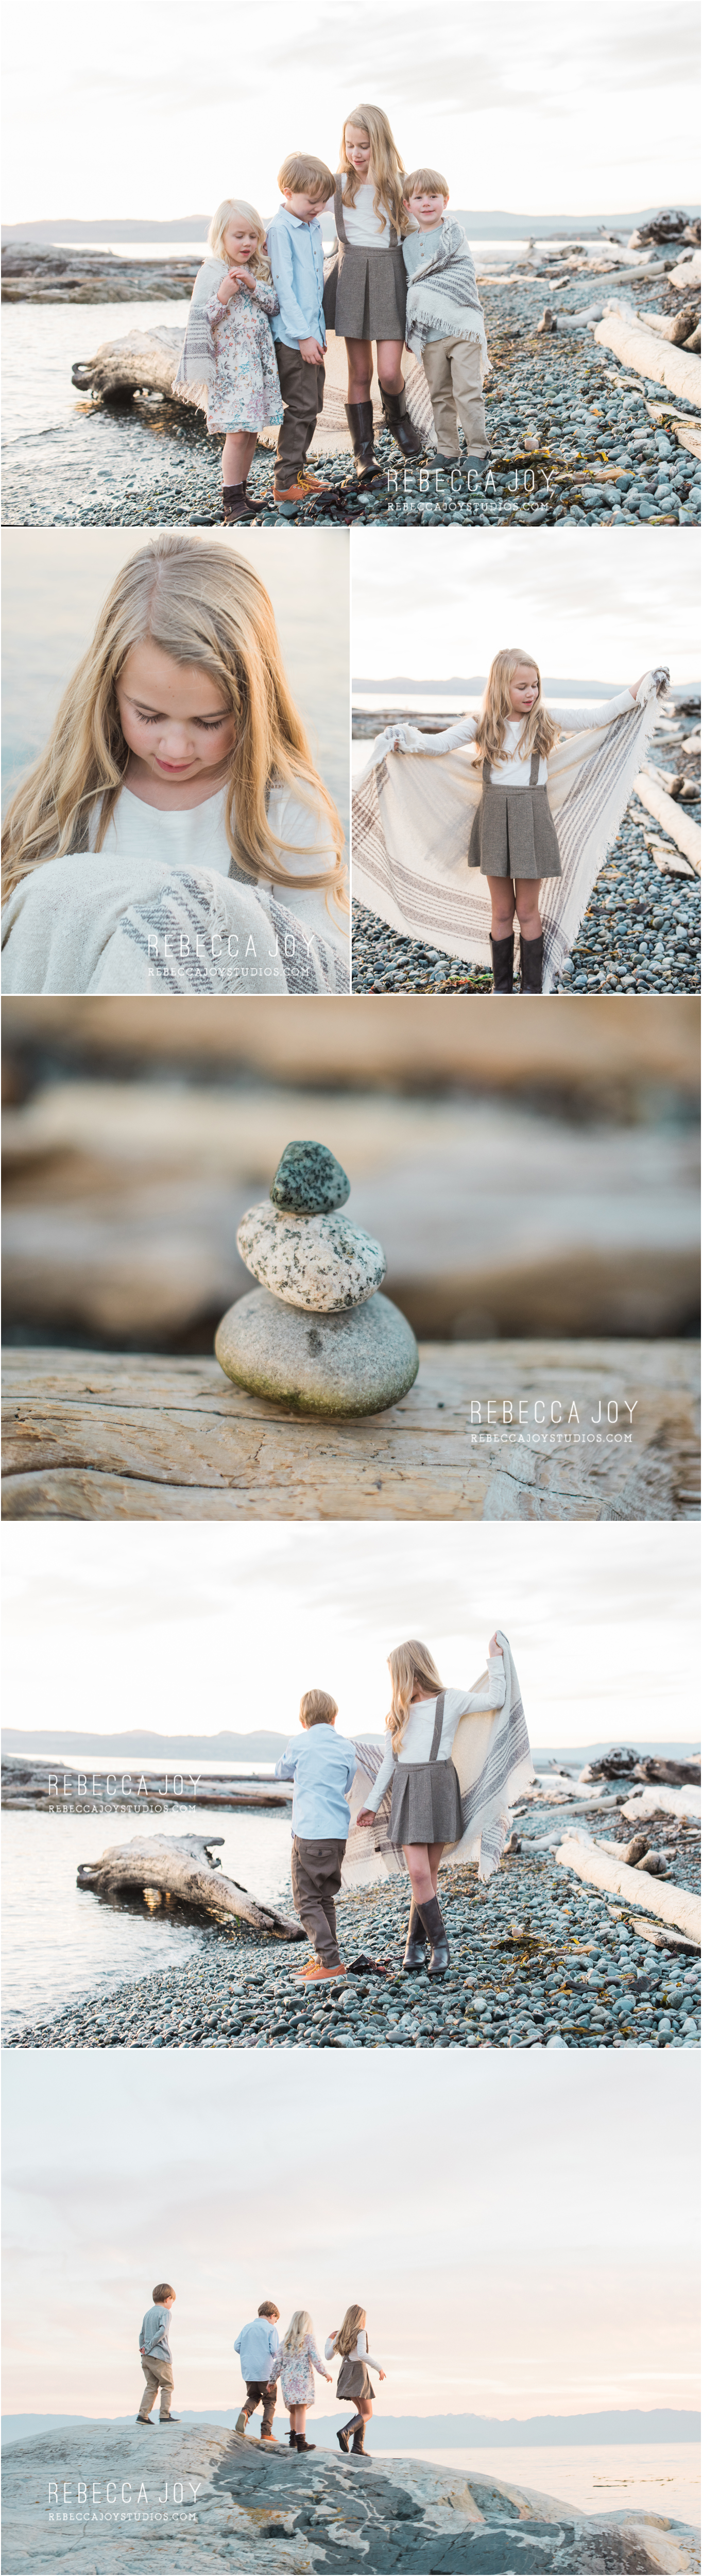 Rebecca Joy Studios | Victoria, BC Photographer